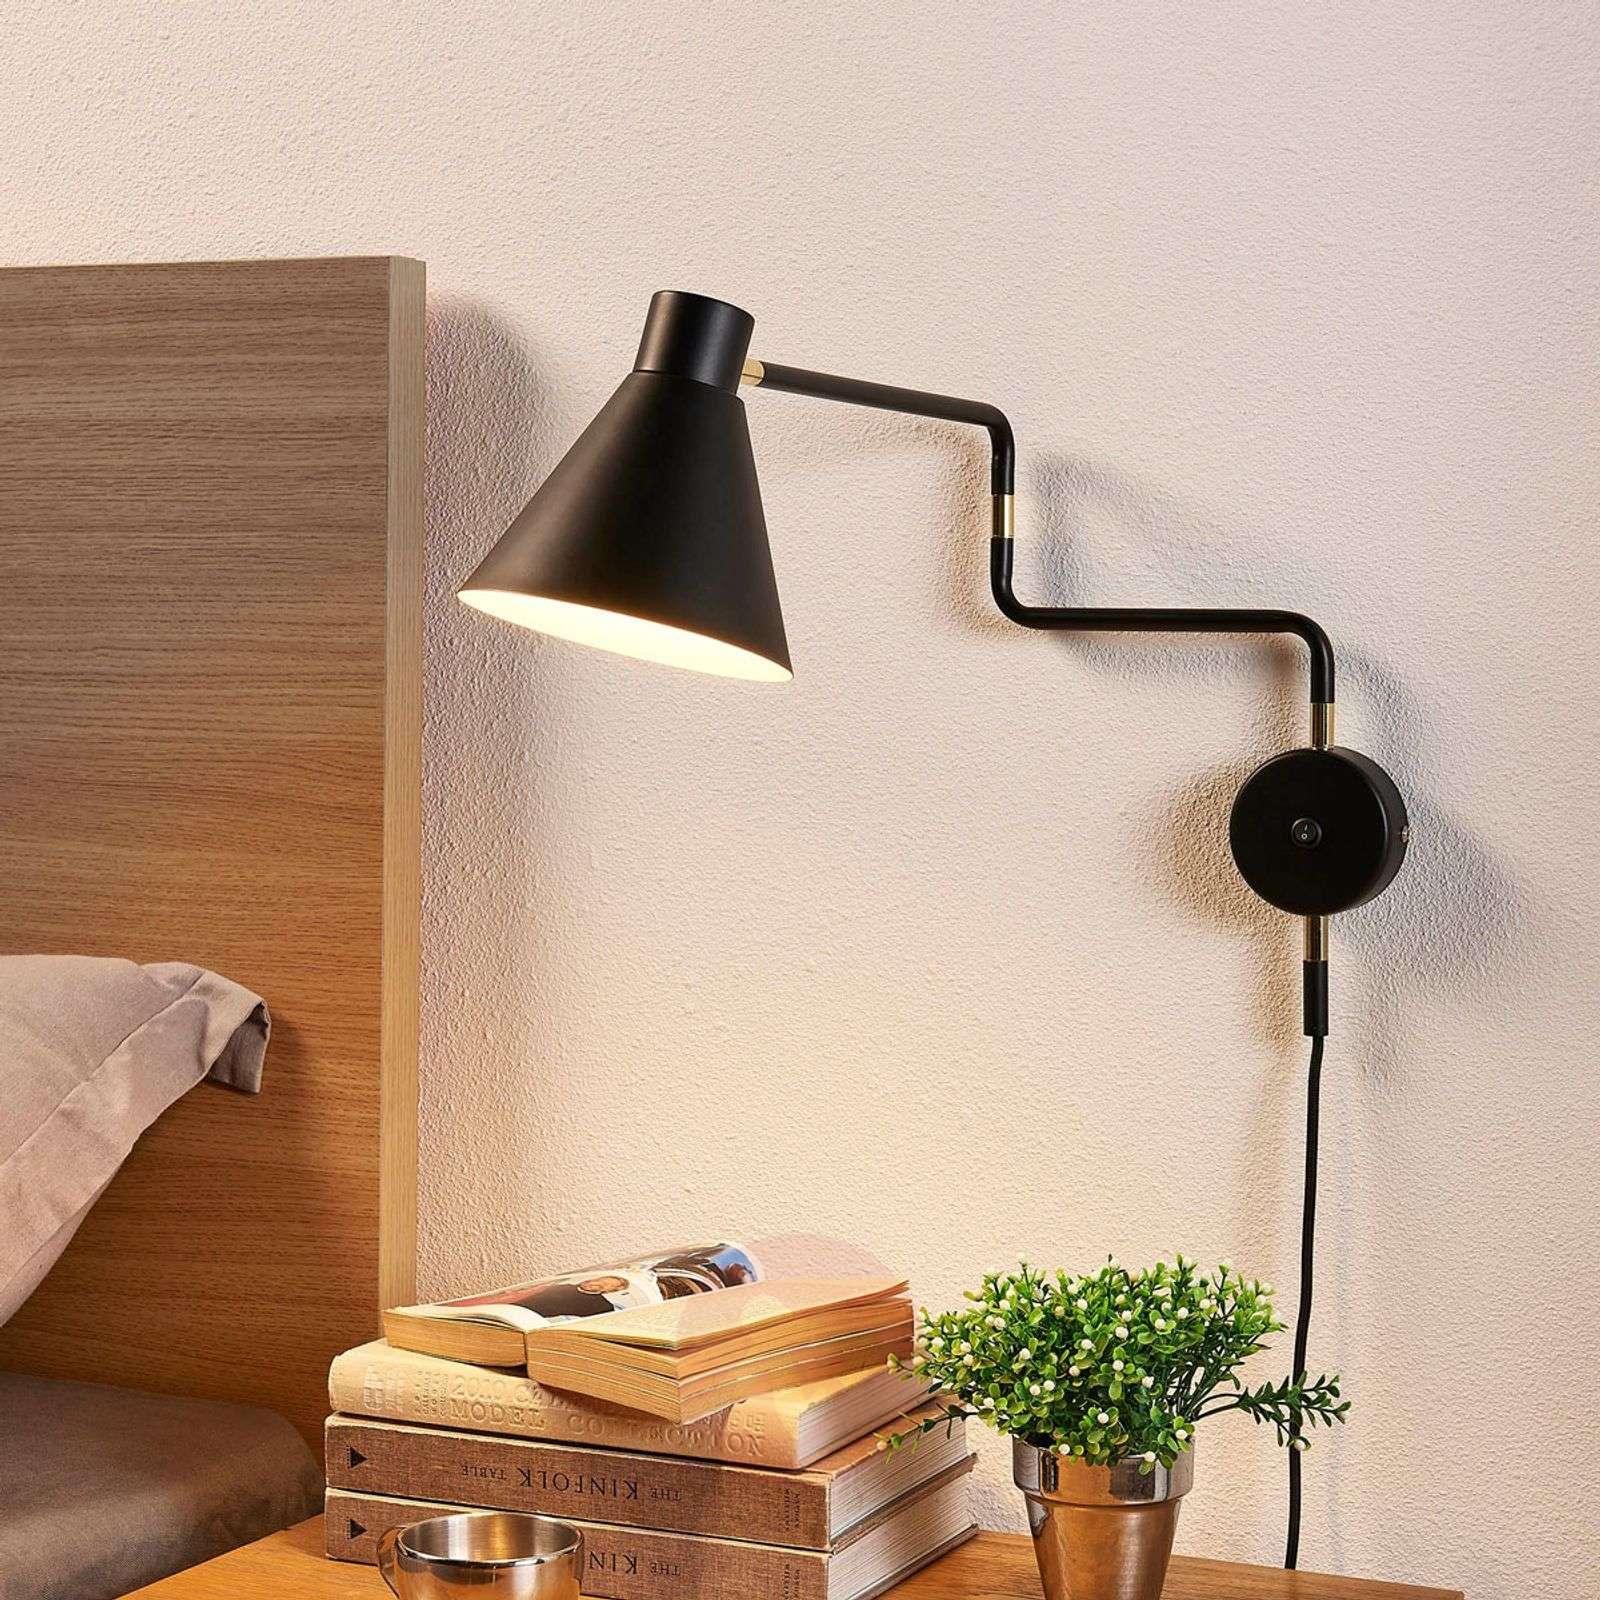 LED wall lamp Pria in black-9621096-01